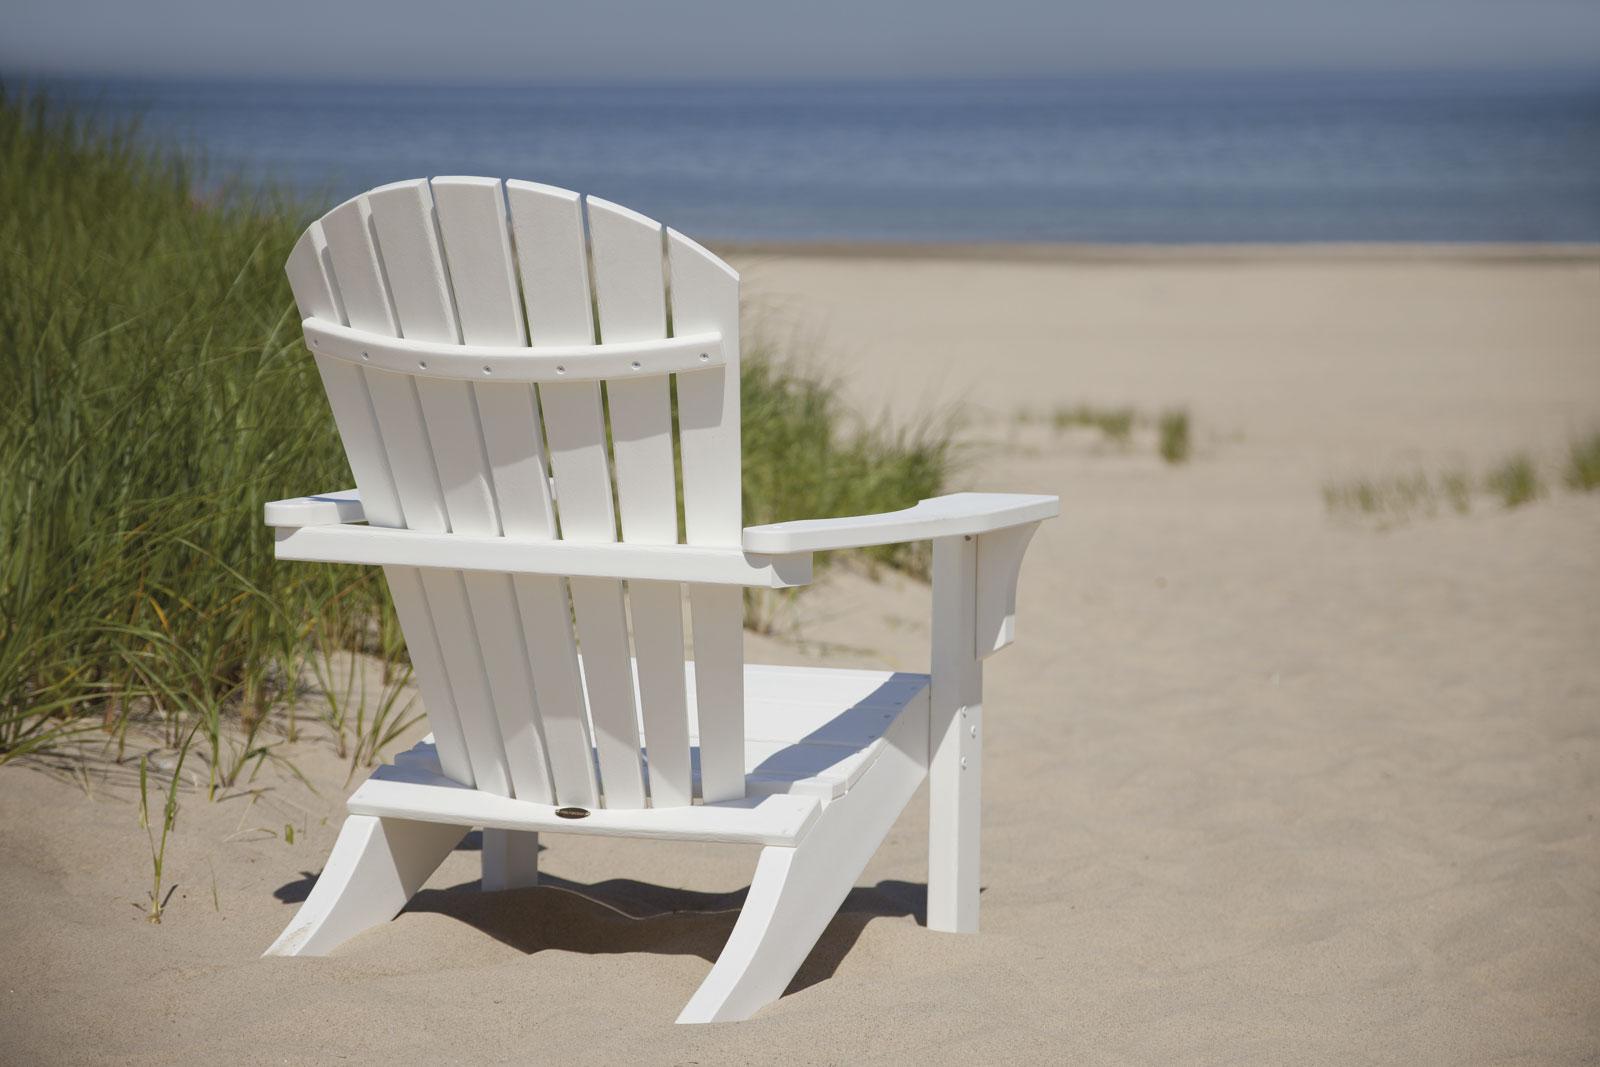 Polywood Seashell Recycled Plastic Adirondack Chair